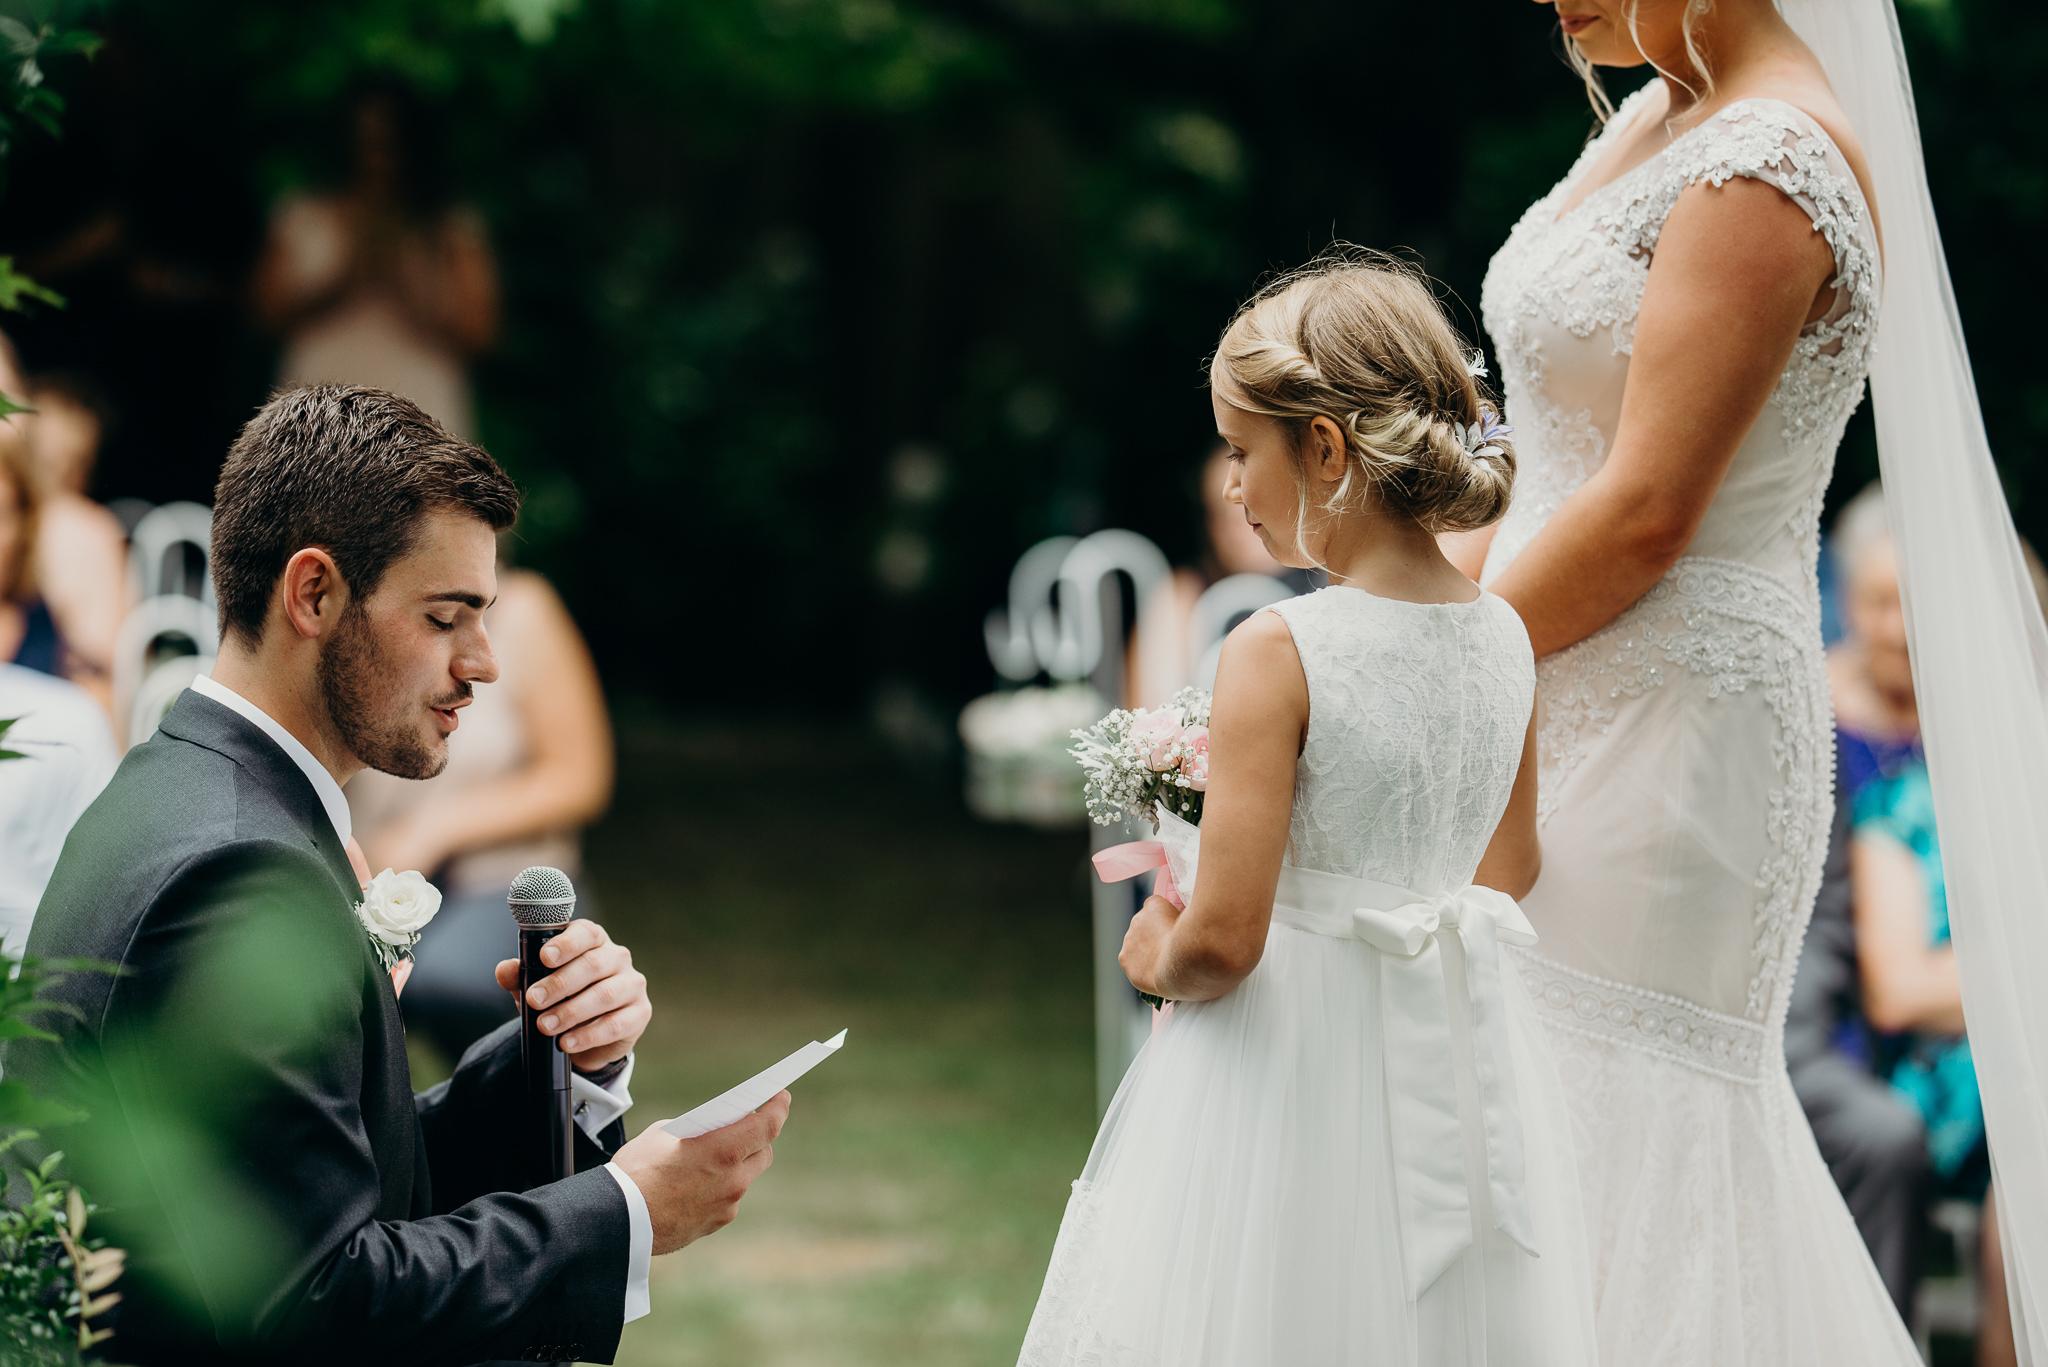 Tauranga-Coromandel-Elegant-Wedding-Photographer-Charlemagne-Lodge-66.jpg